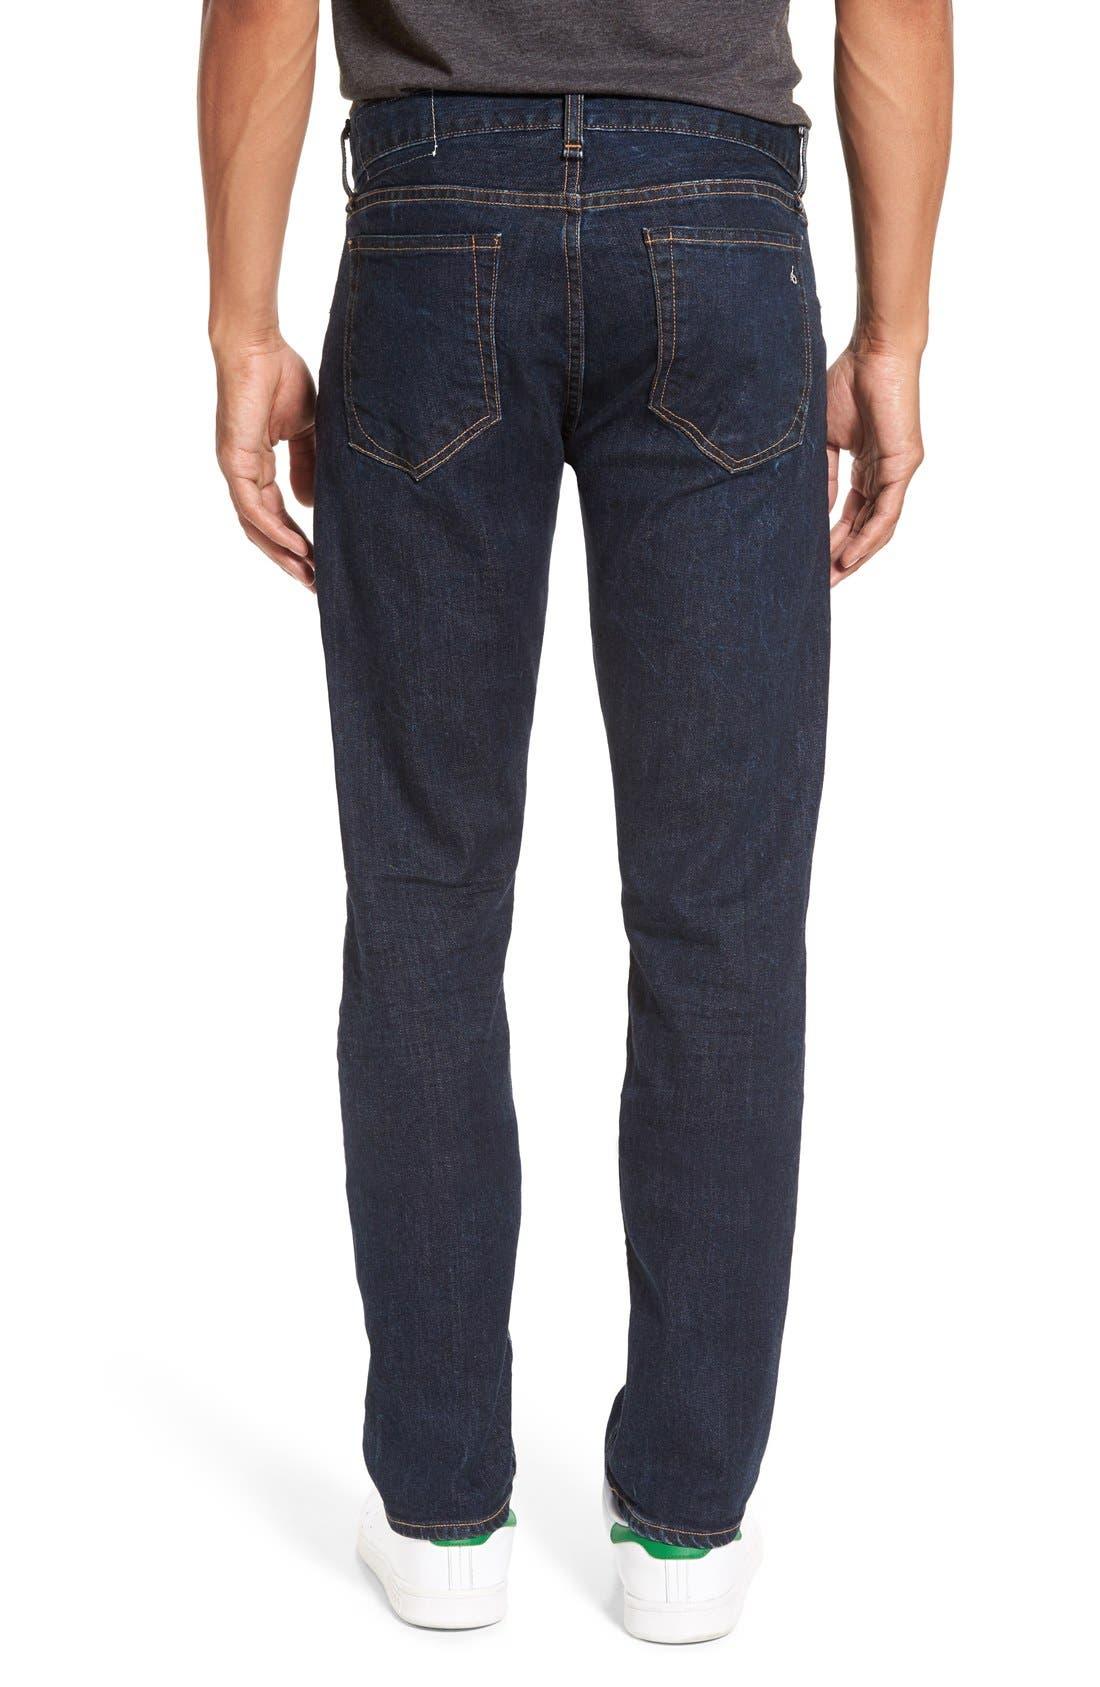 RAG & BONE, Standard Issue Fit 3 Slim Straight Leg Jeans, Alternate thumbnail 9, color, HERITAGE